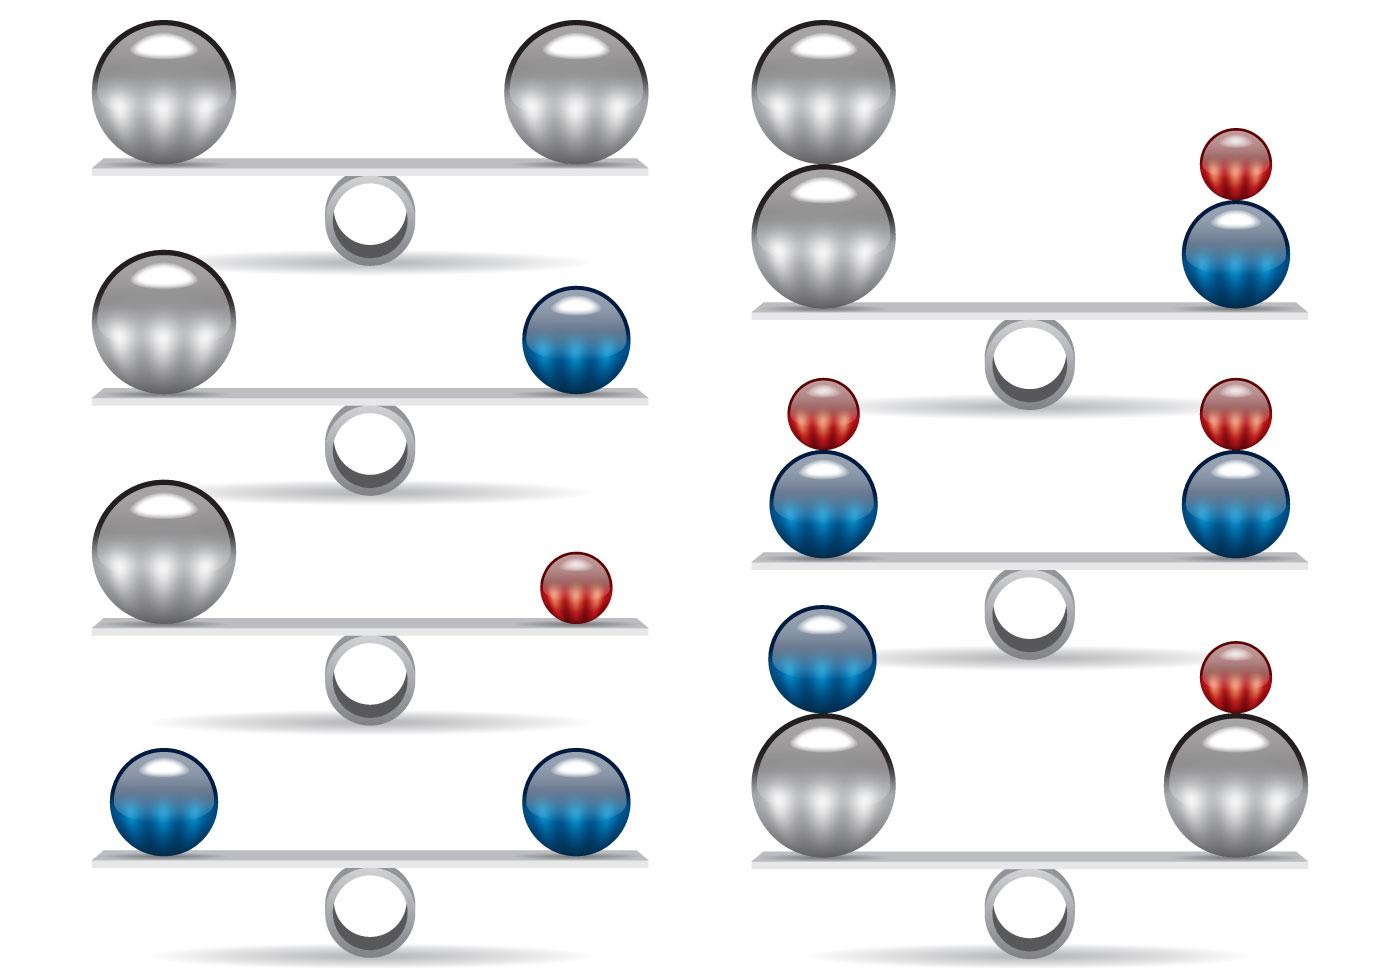 balancing chrome sphere vectors download free vector art vector spherical harmonics on fermi surfaces vector spherical harmonics c++